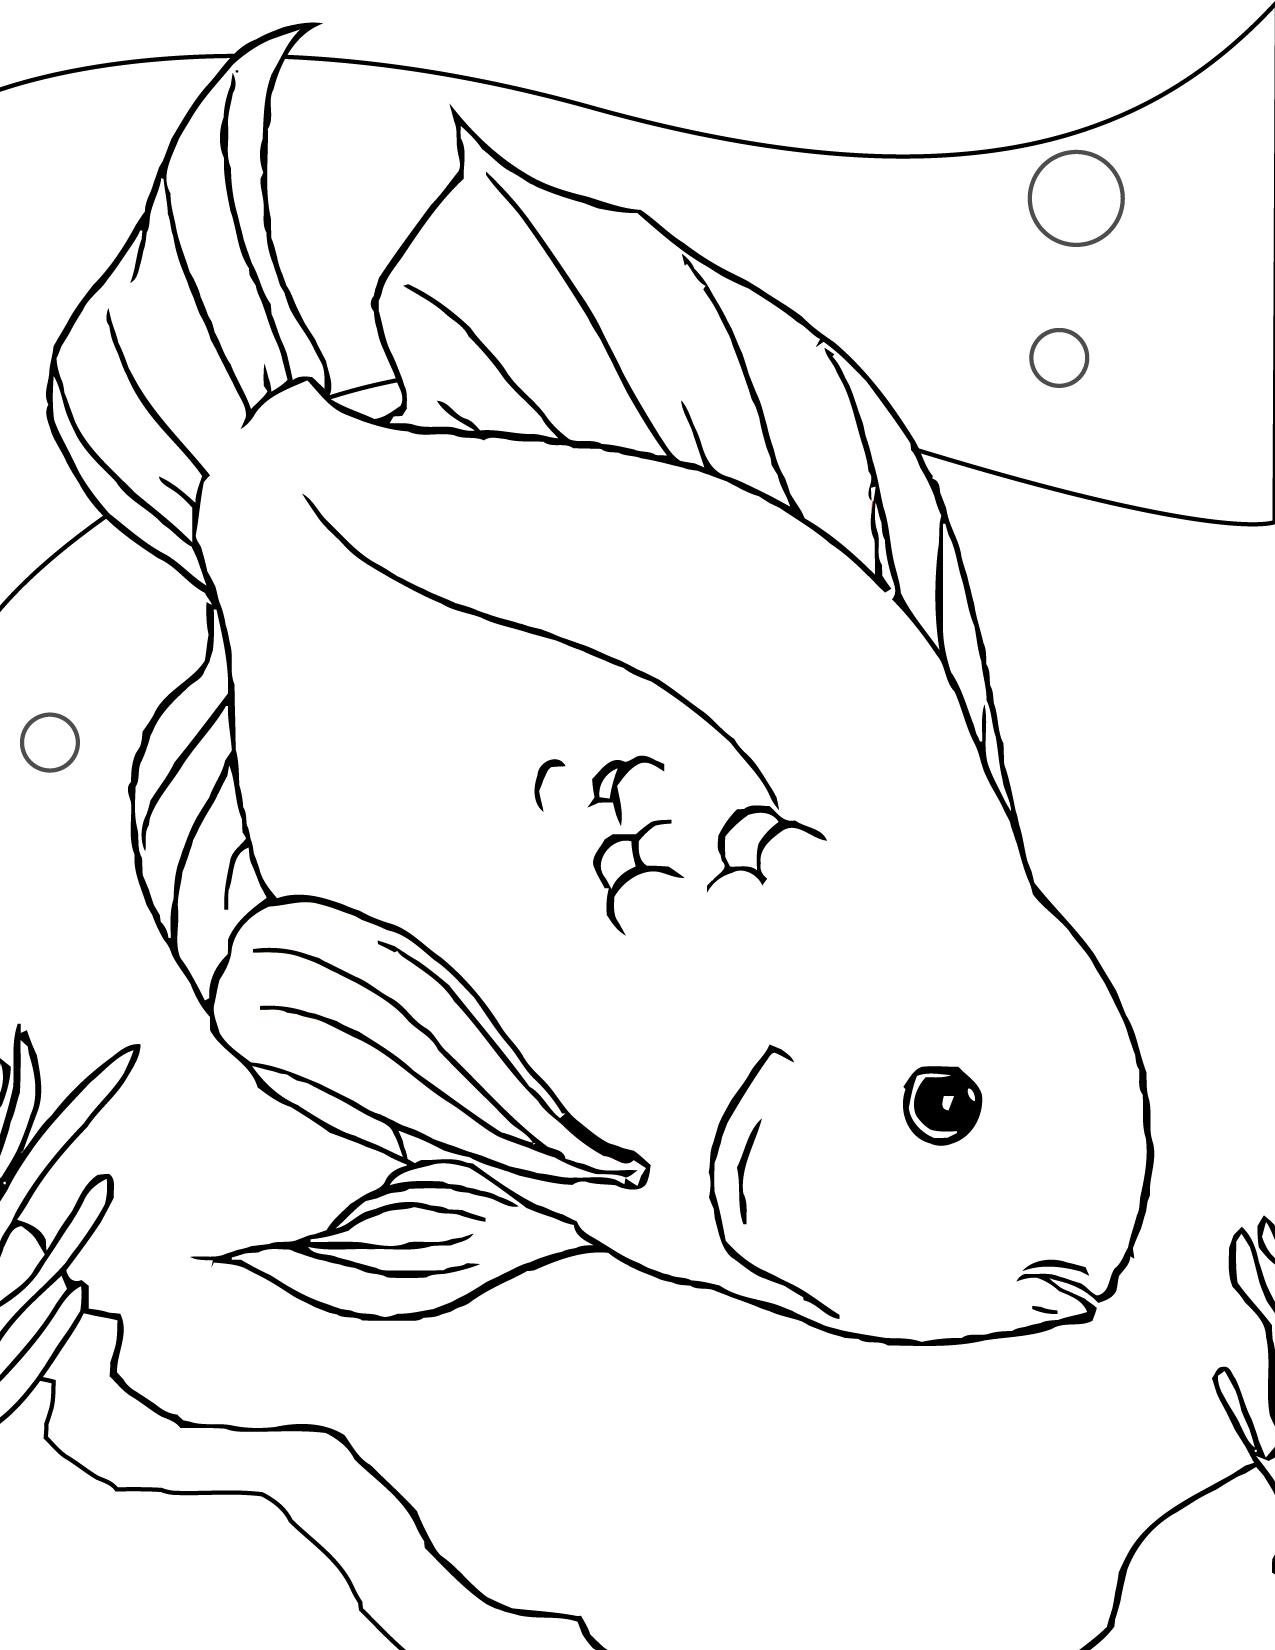 1275x1650 Fish To Print New Coloring Sheets